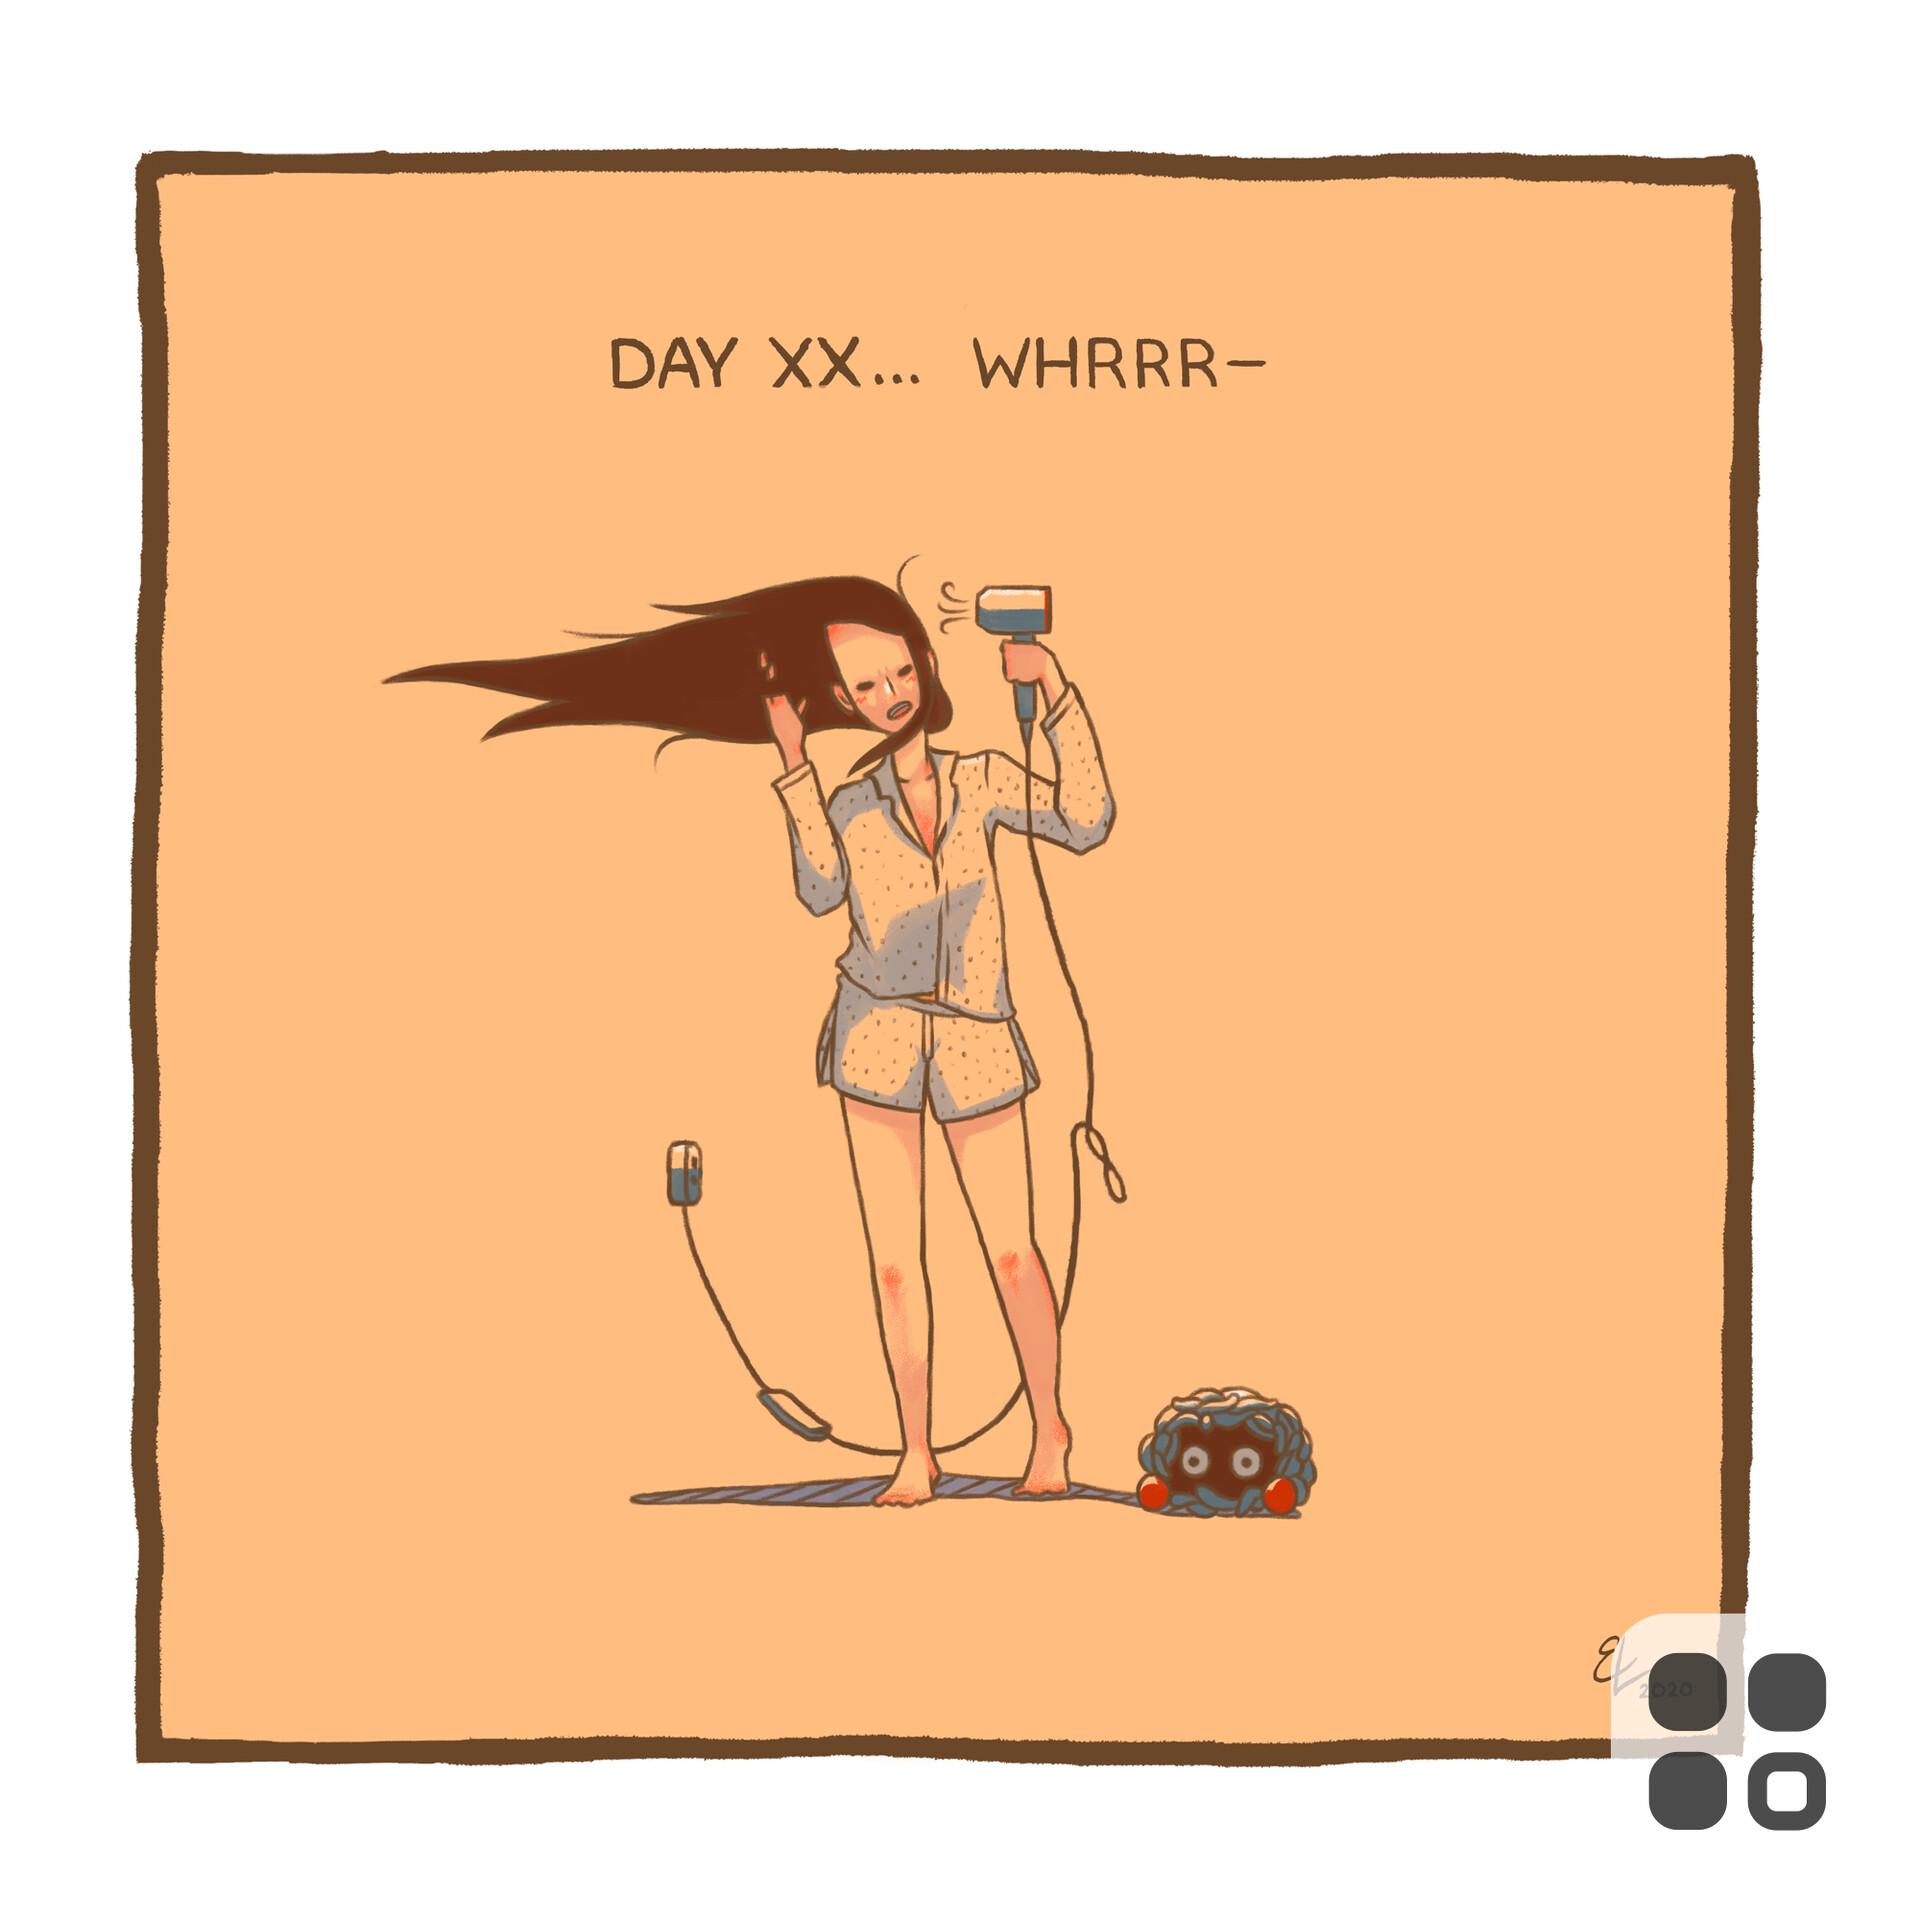 Day XX - Week Two